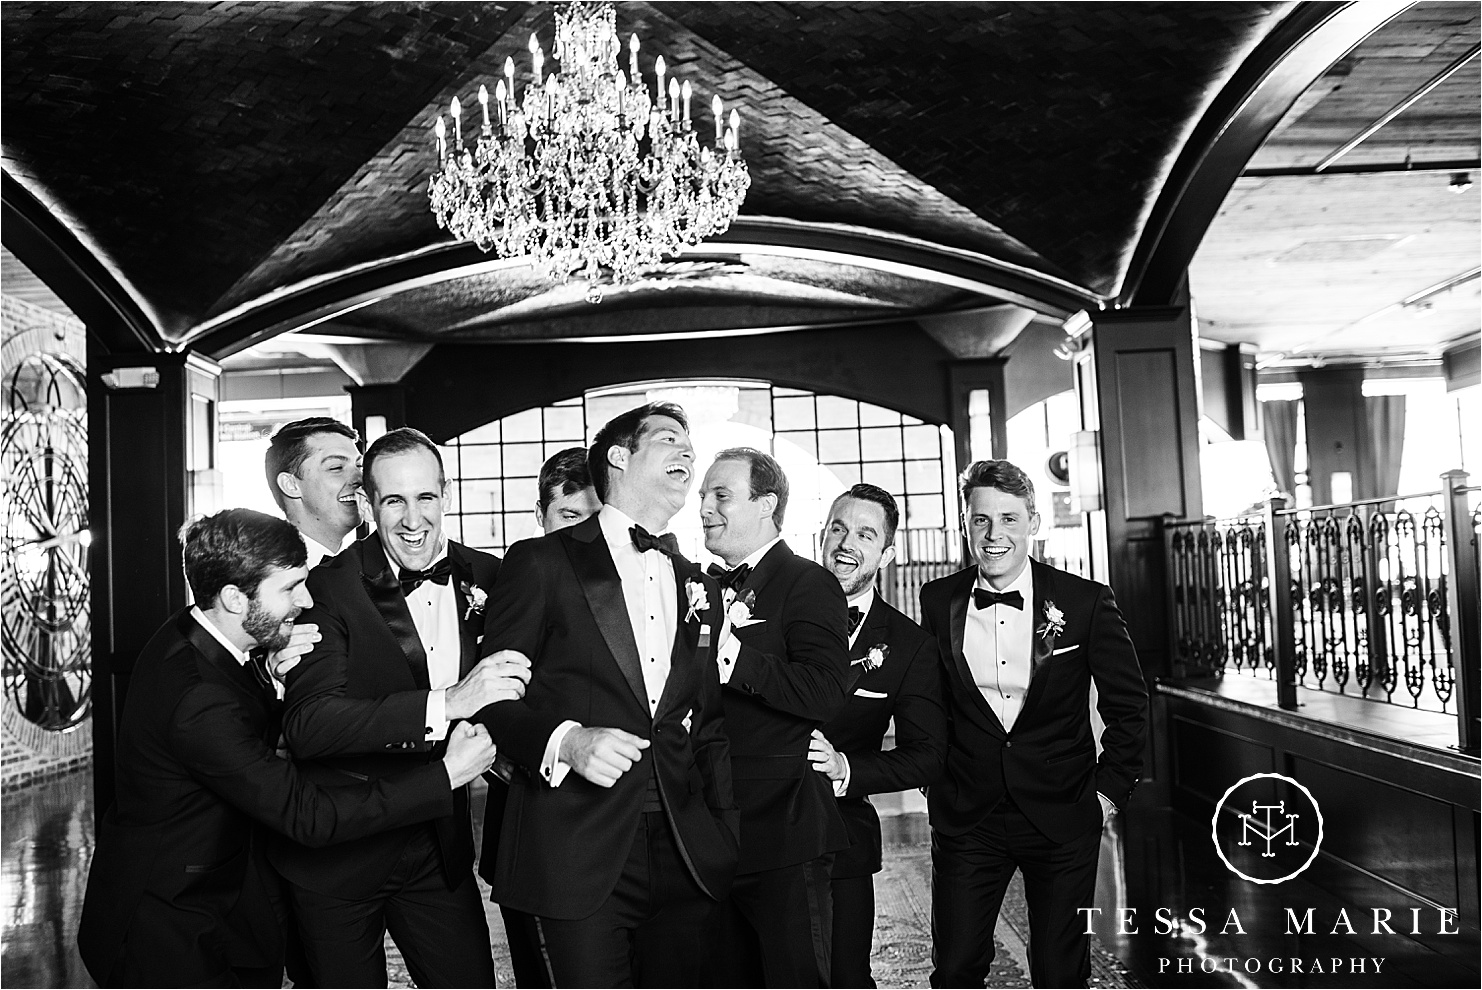 Tessa_marie_weddings_houston_wedding_photographer_The_astorian_0082.jpg